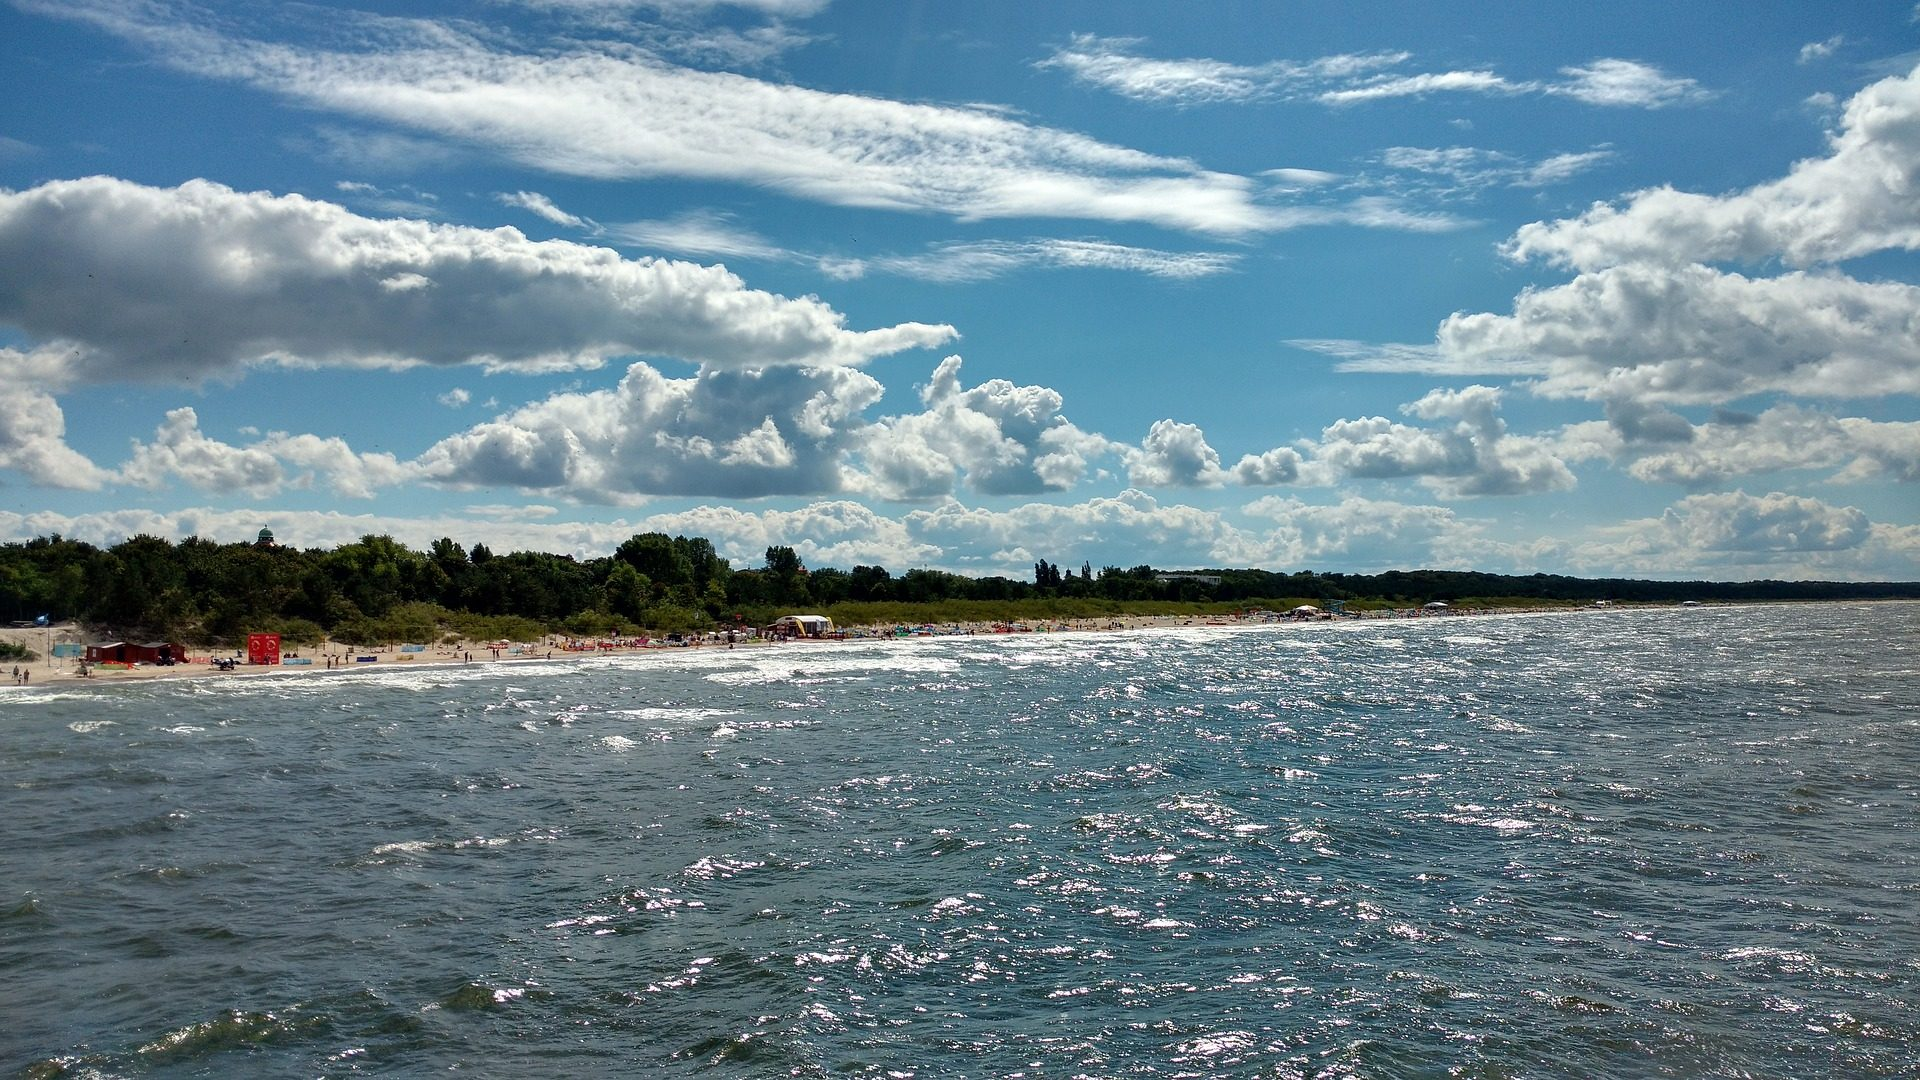 Spiaggia, Mare, onde, Cielo, nuvole, Báltico - Sfondi HD - Professor-falken.com